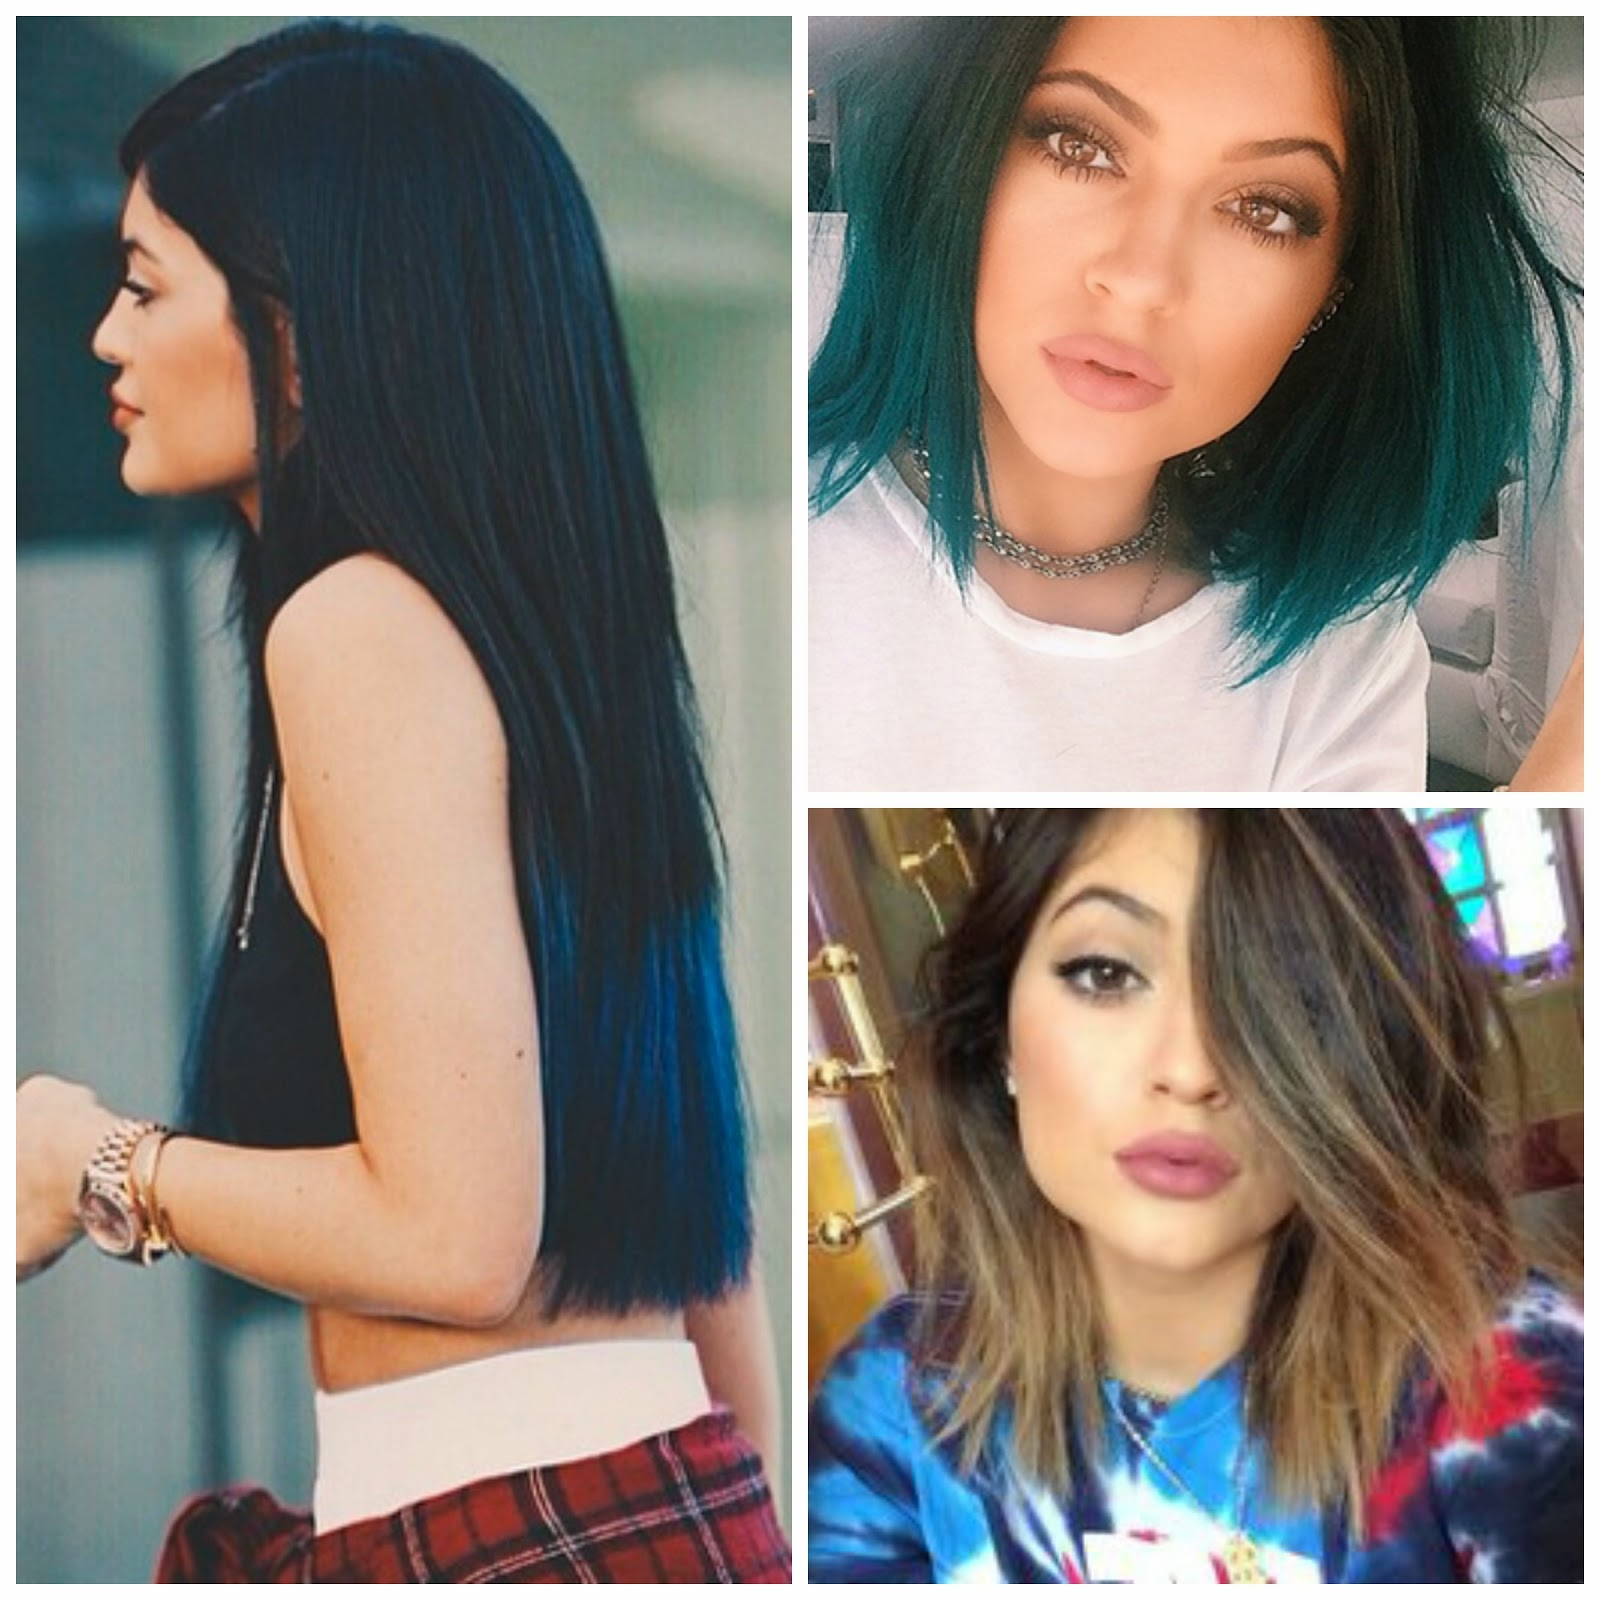 Kylie Jenner's Best Hair Looks